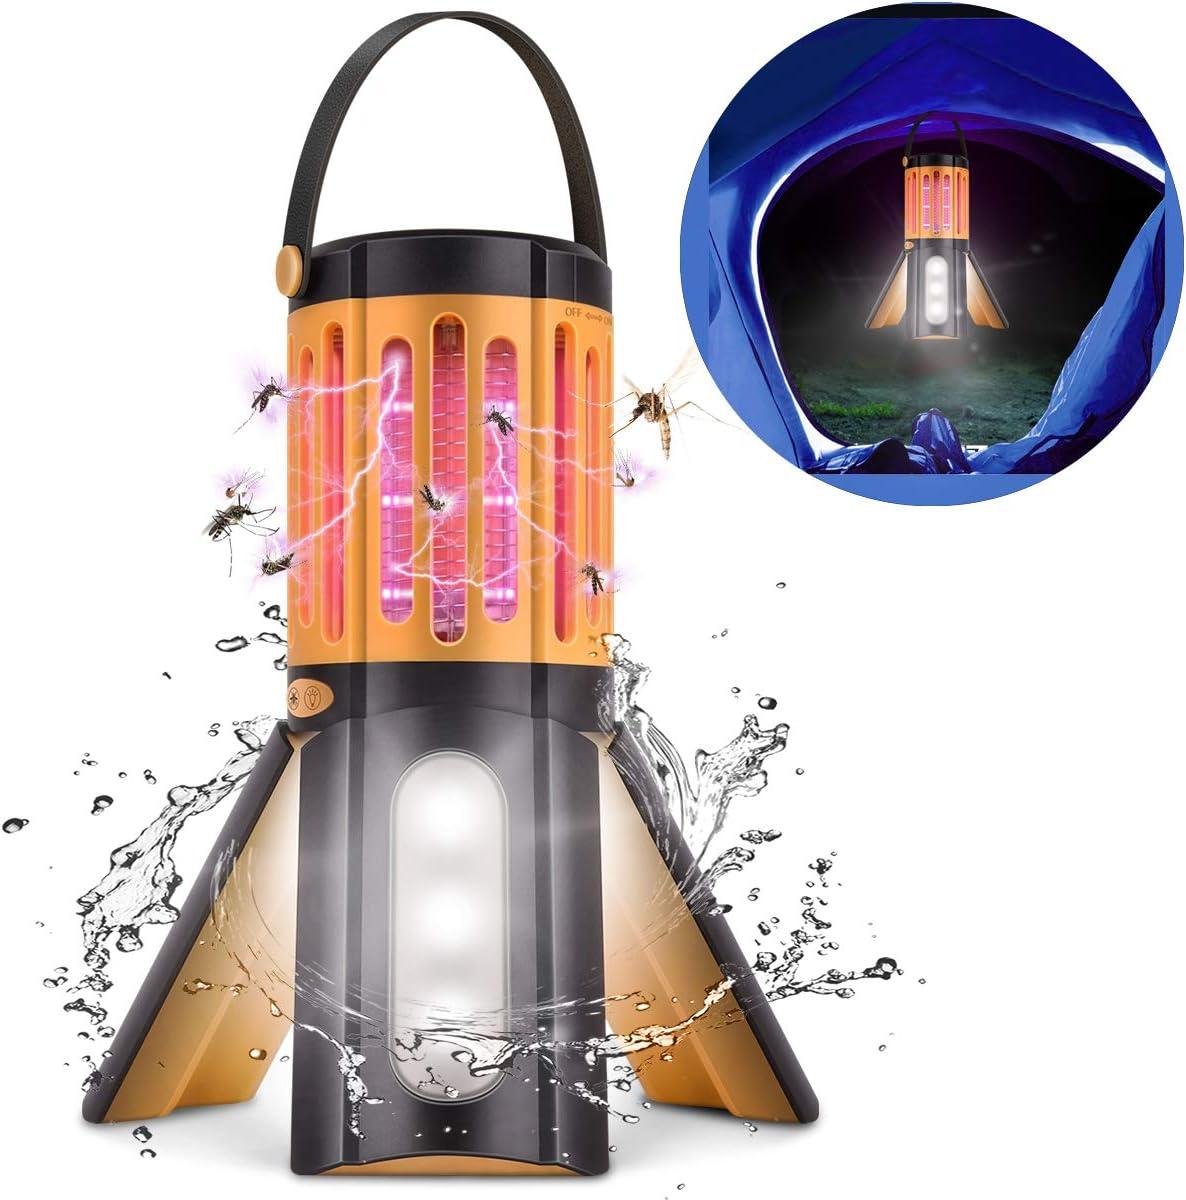 Free Amazon Promo Code 2020 for LED Camping Lantern Bug Zapper